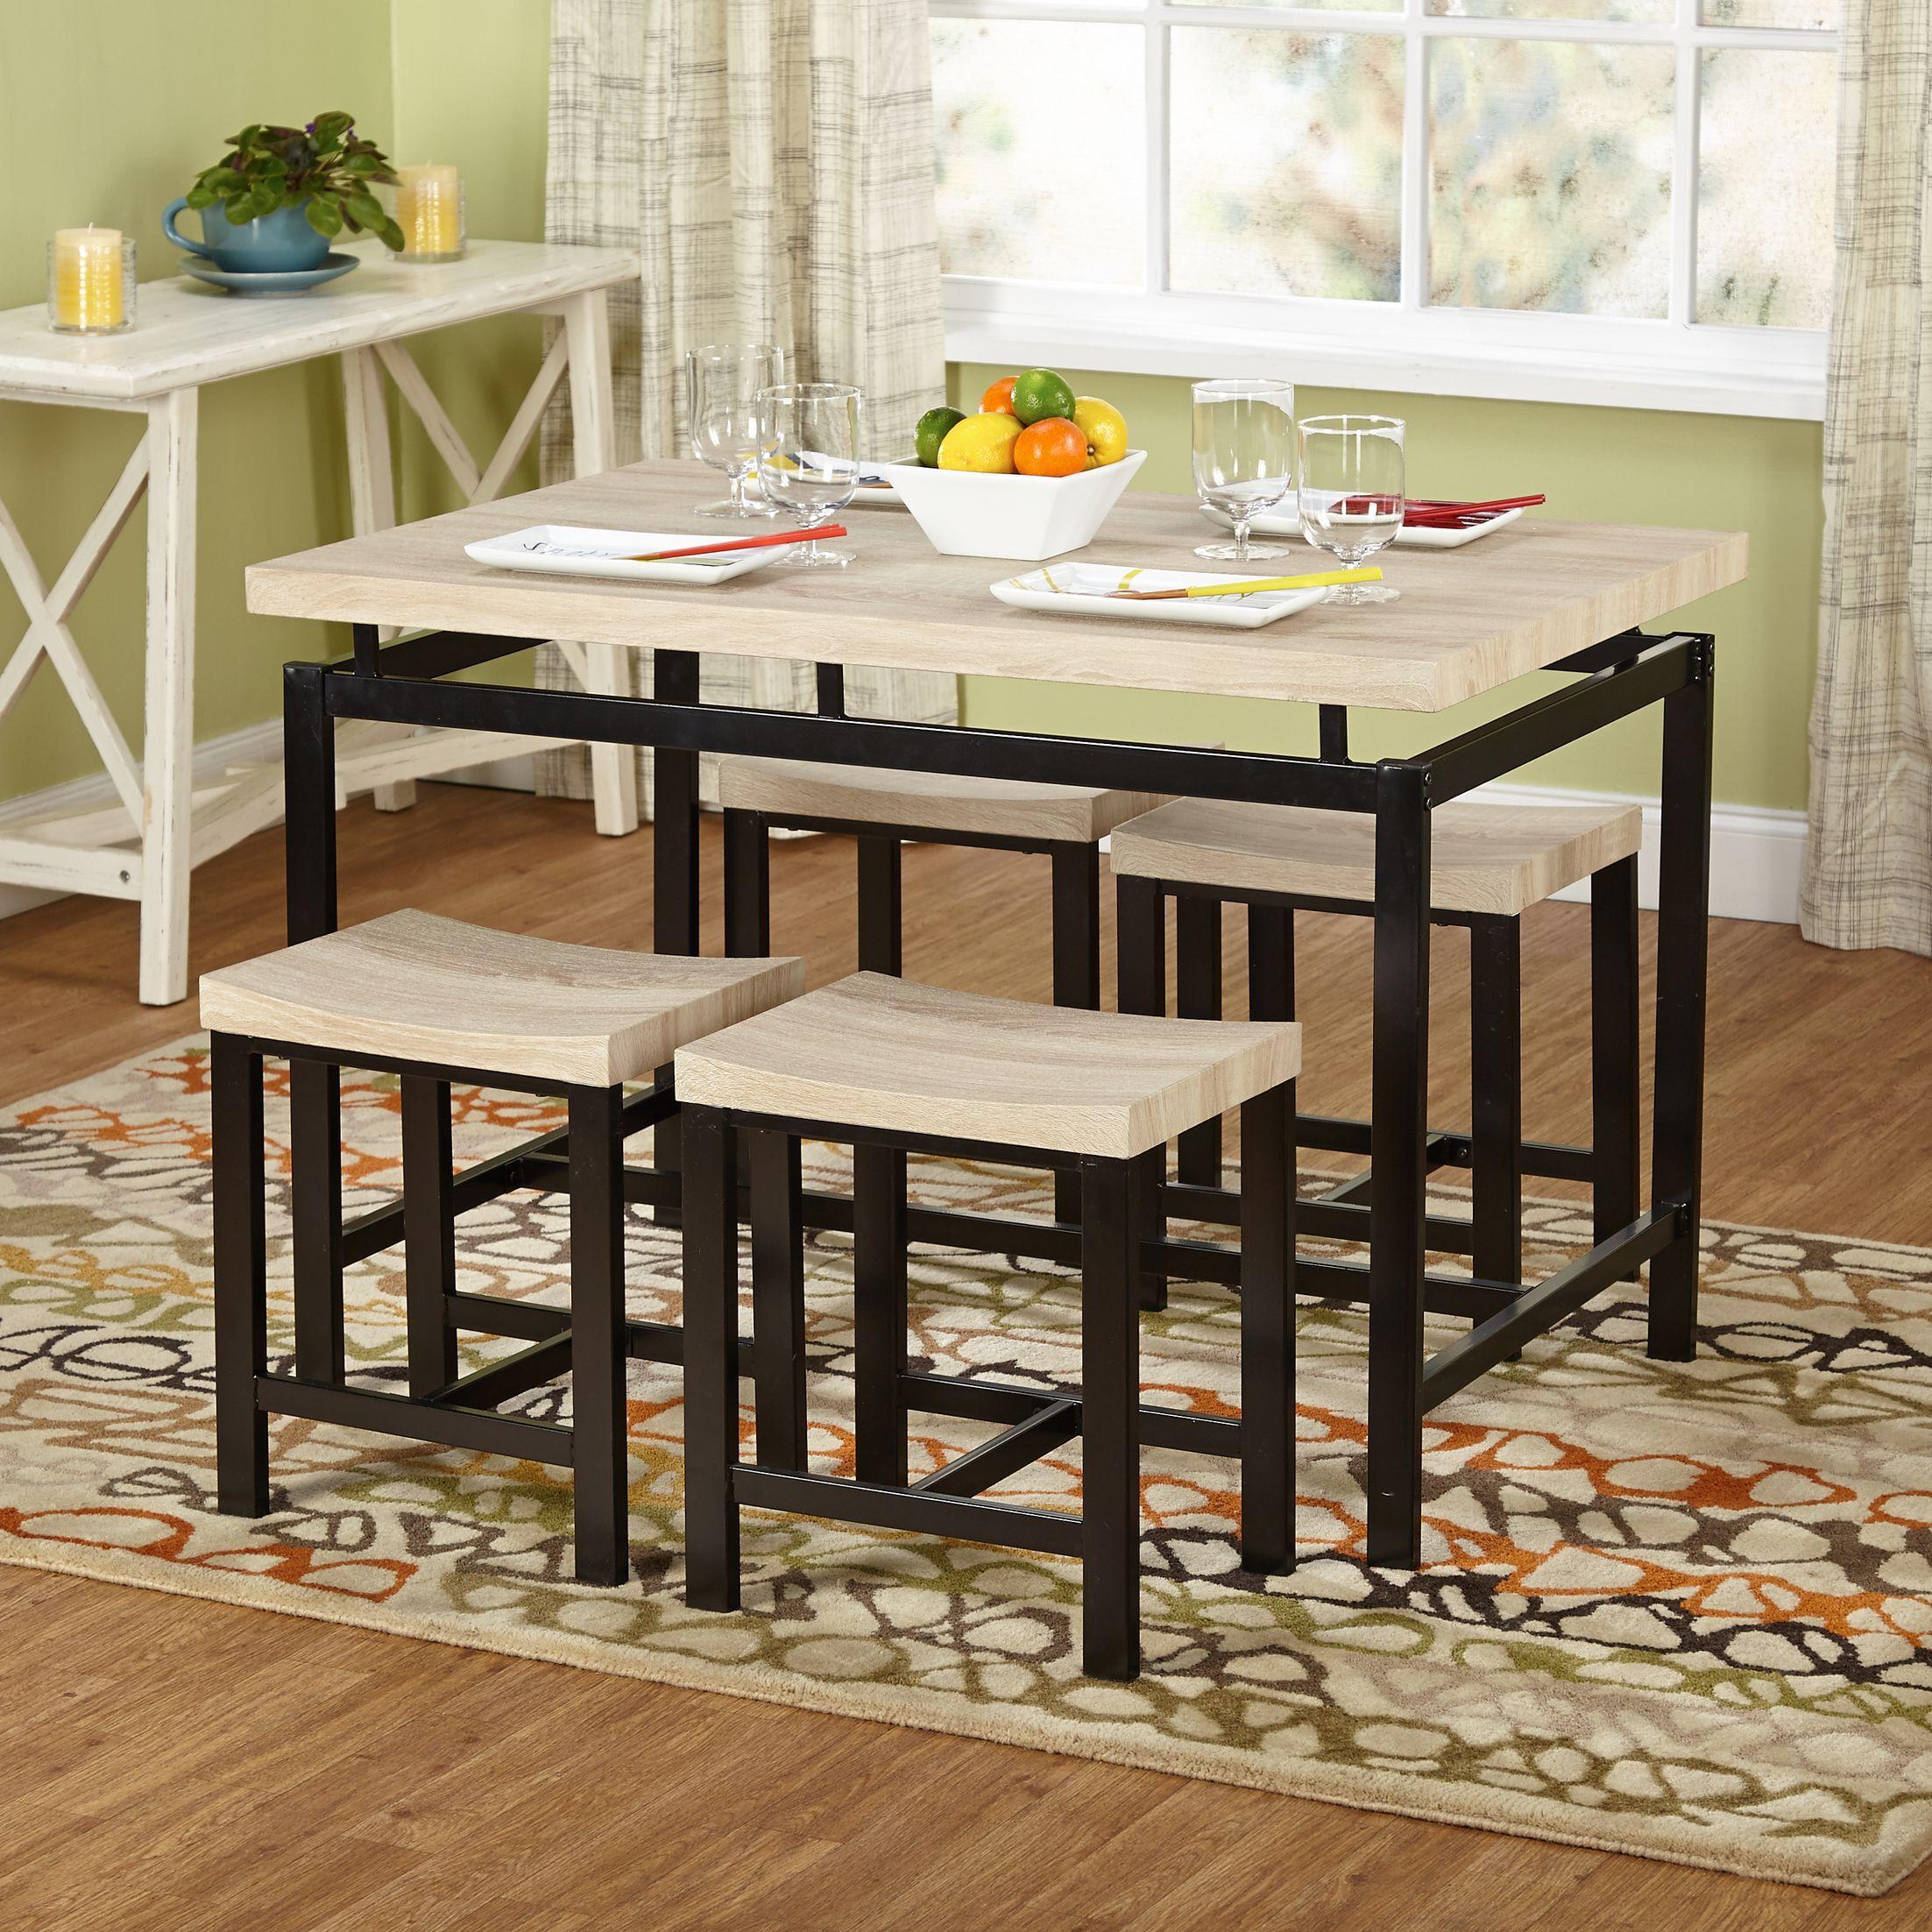 delano 5 piece dining set kitchen upgrade dining furniture sets rh pinterest com